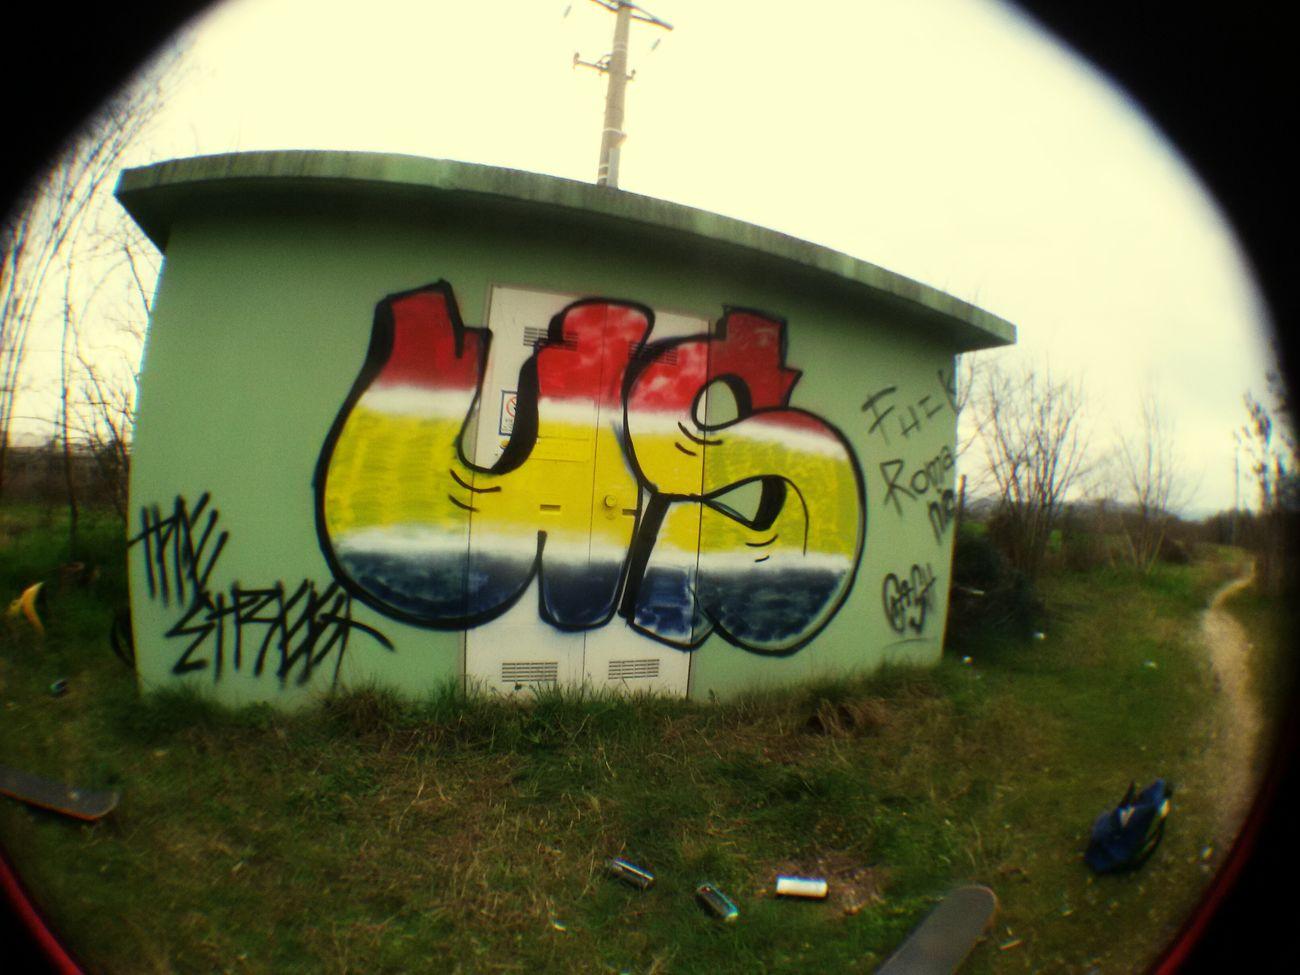 Bombing Oldschool Us Sangiovannilupatoto Underground